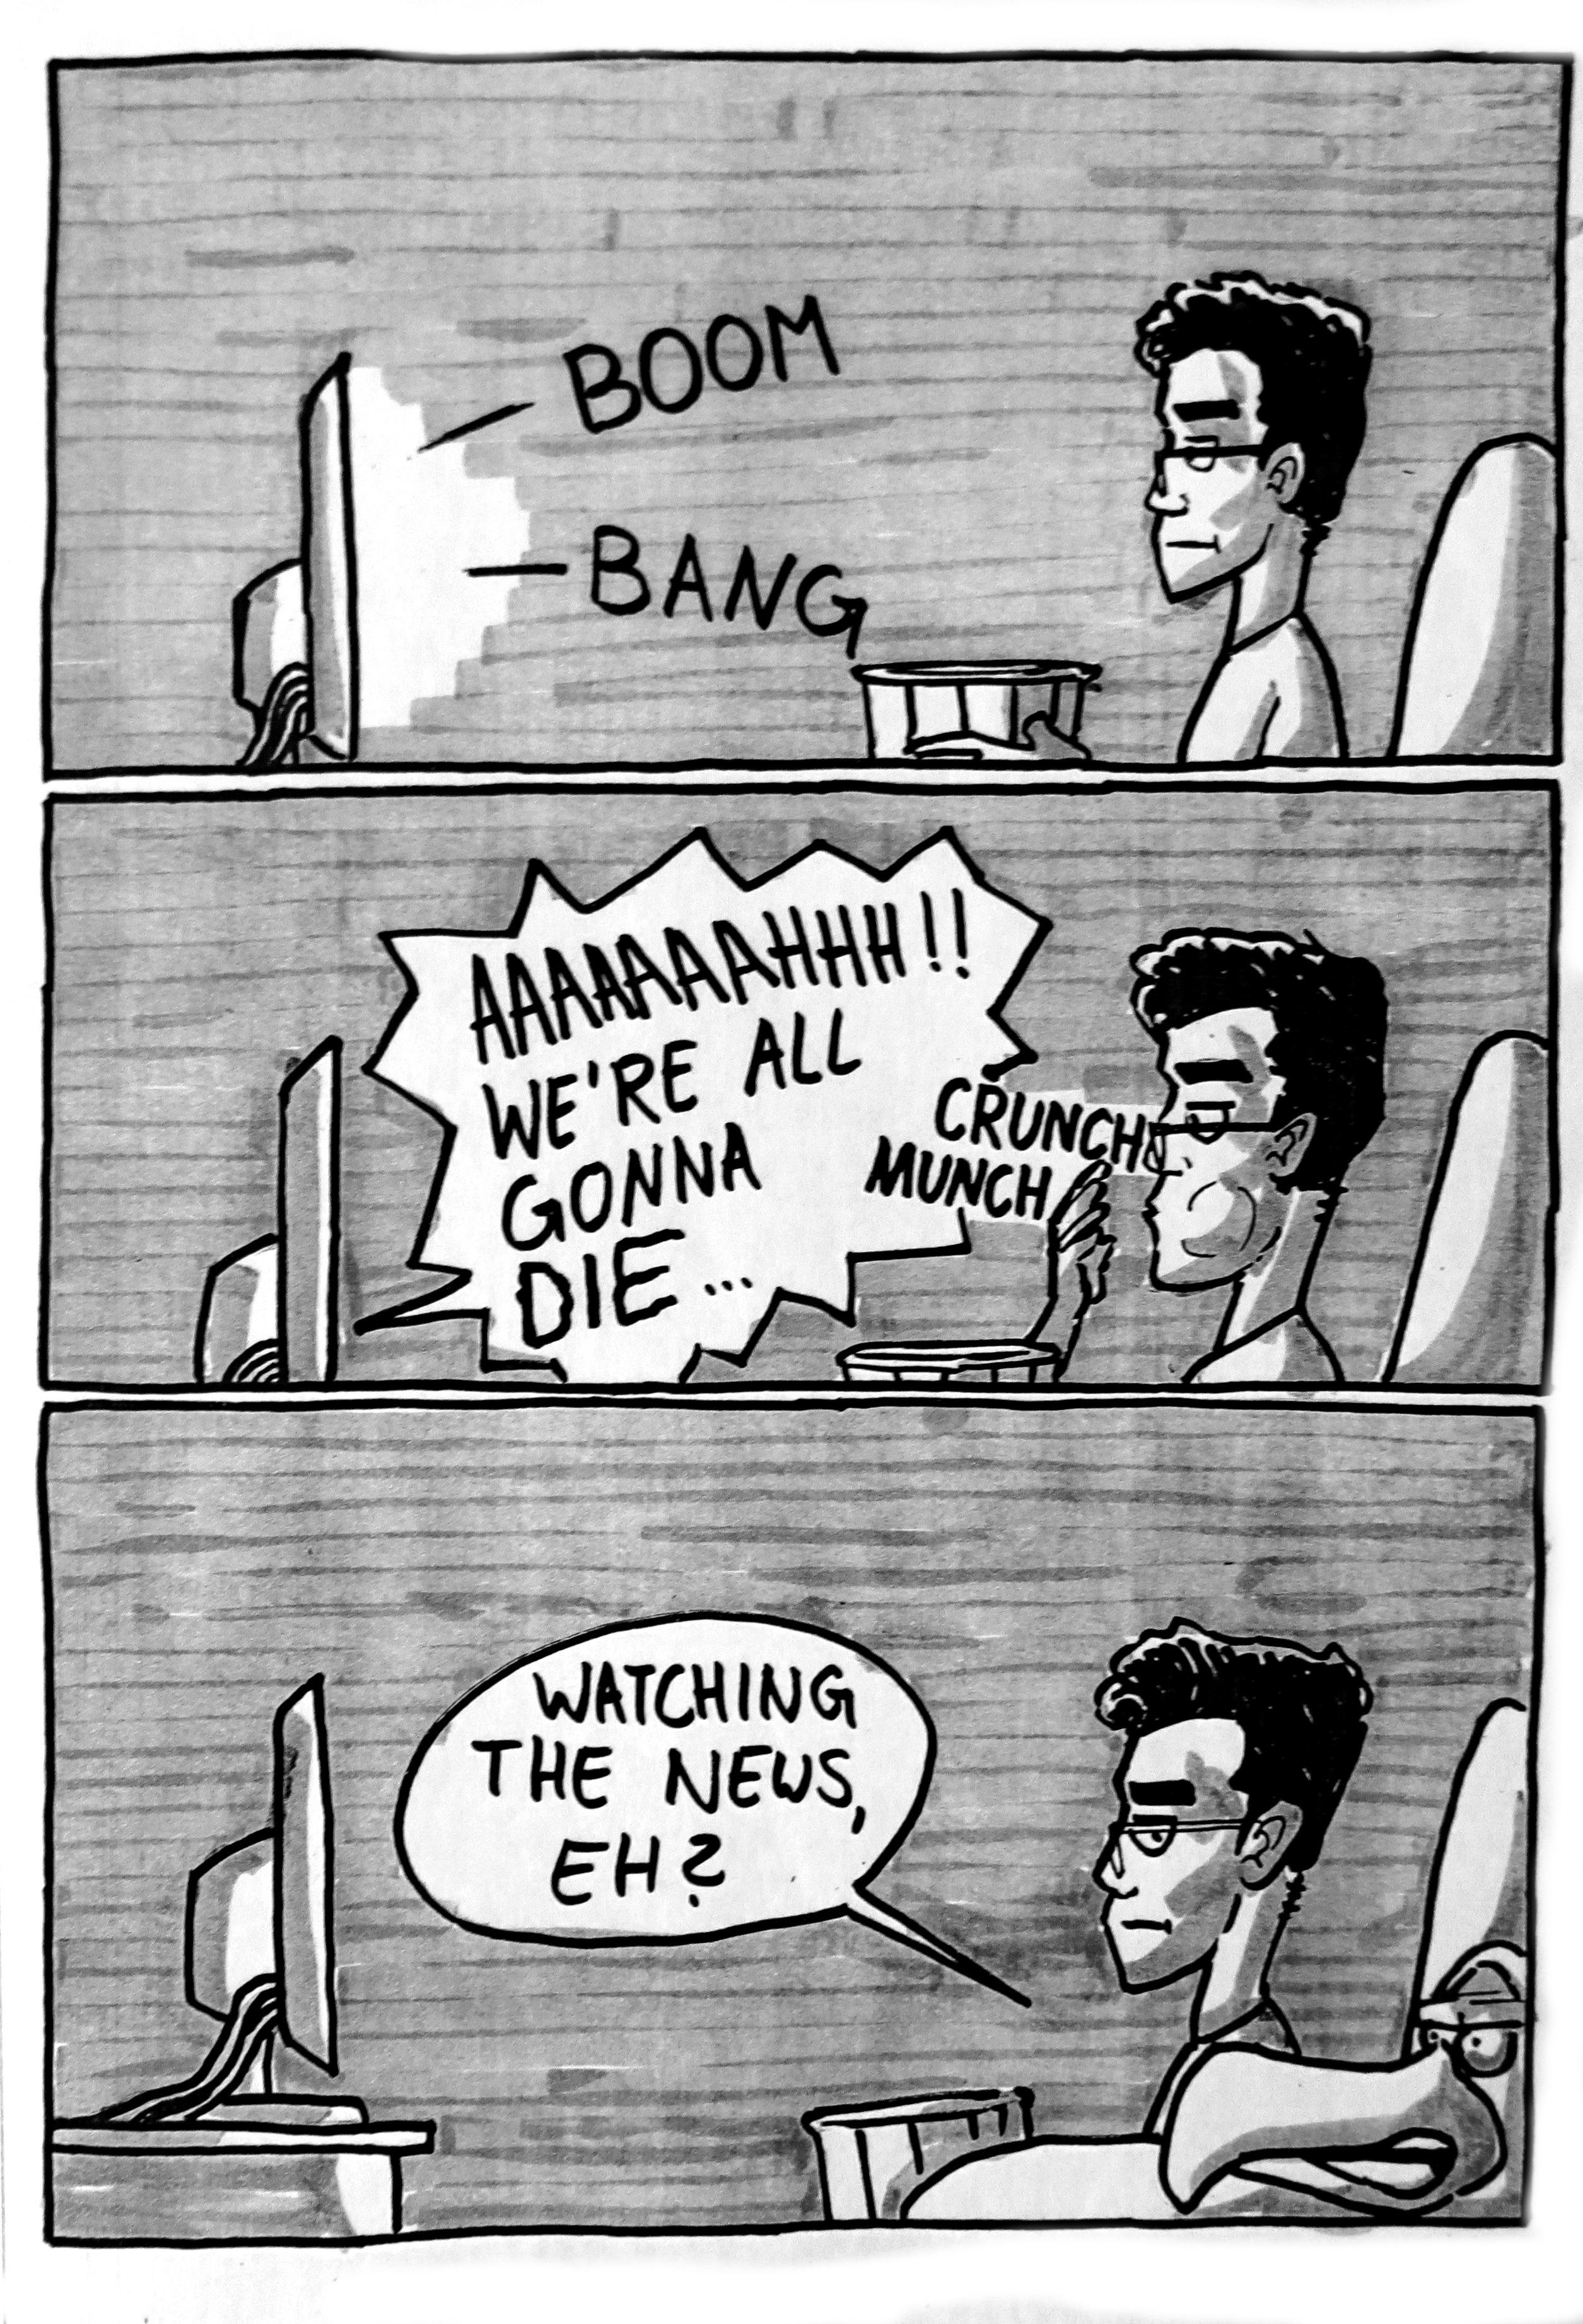 Regular news